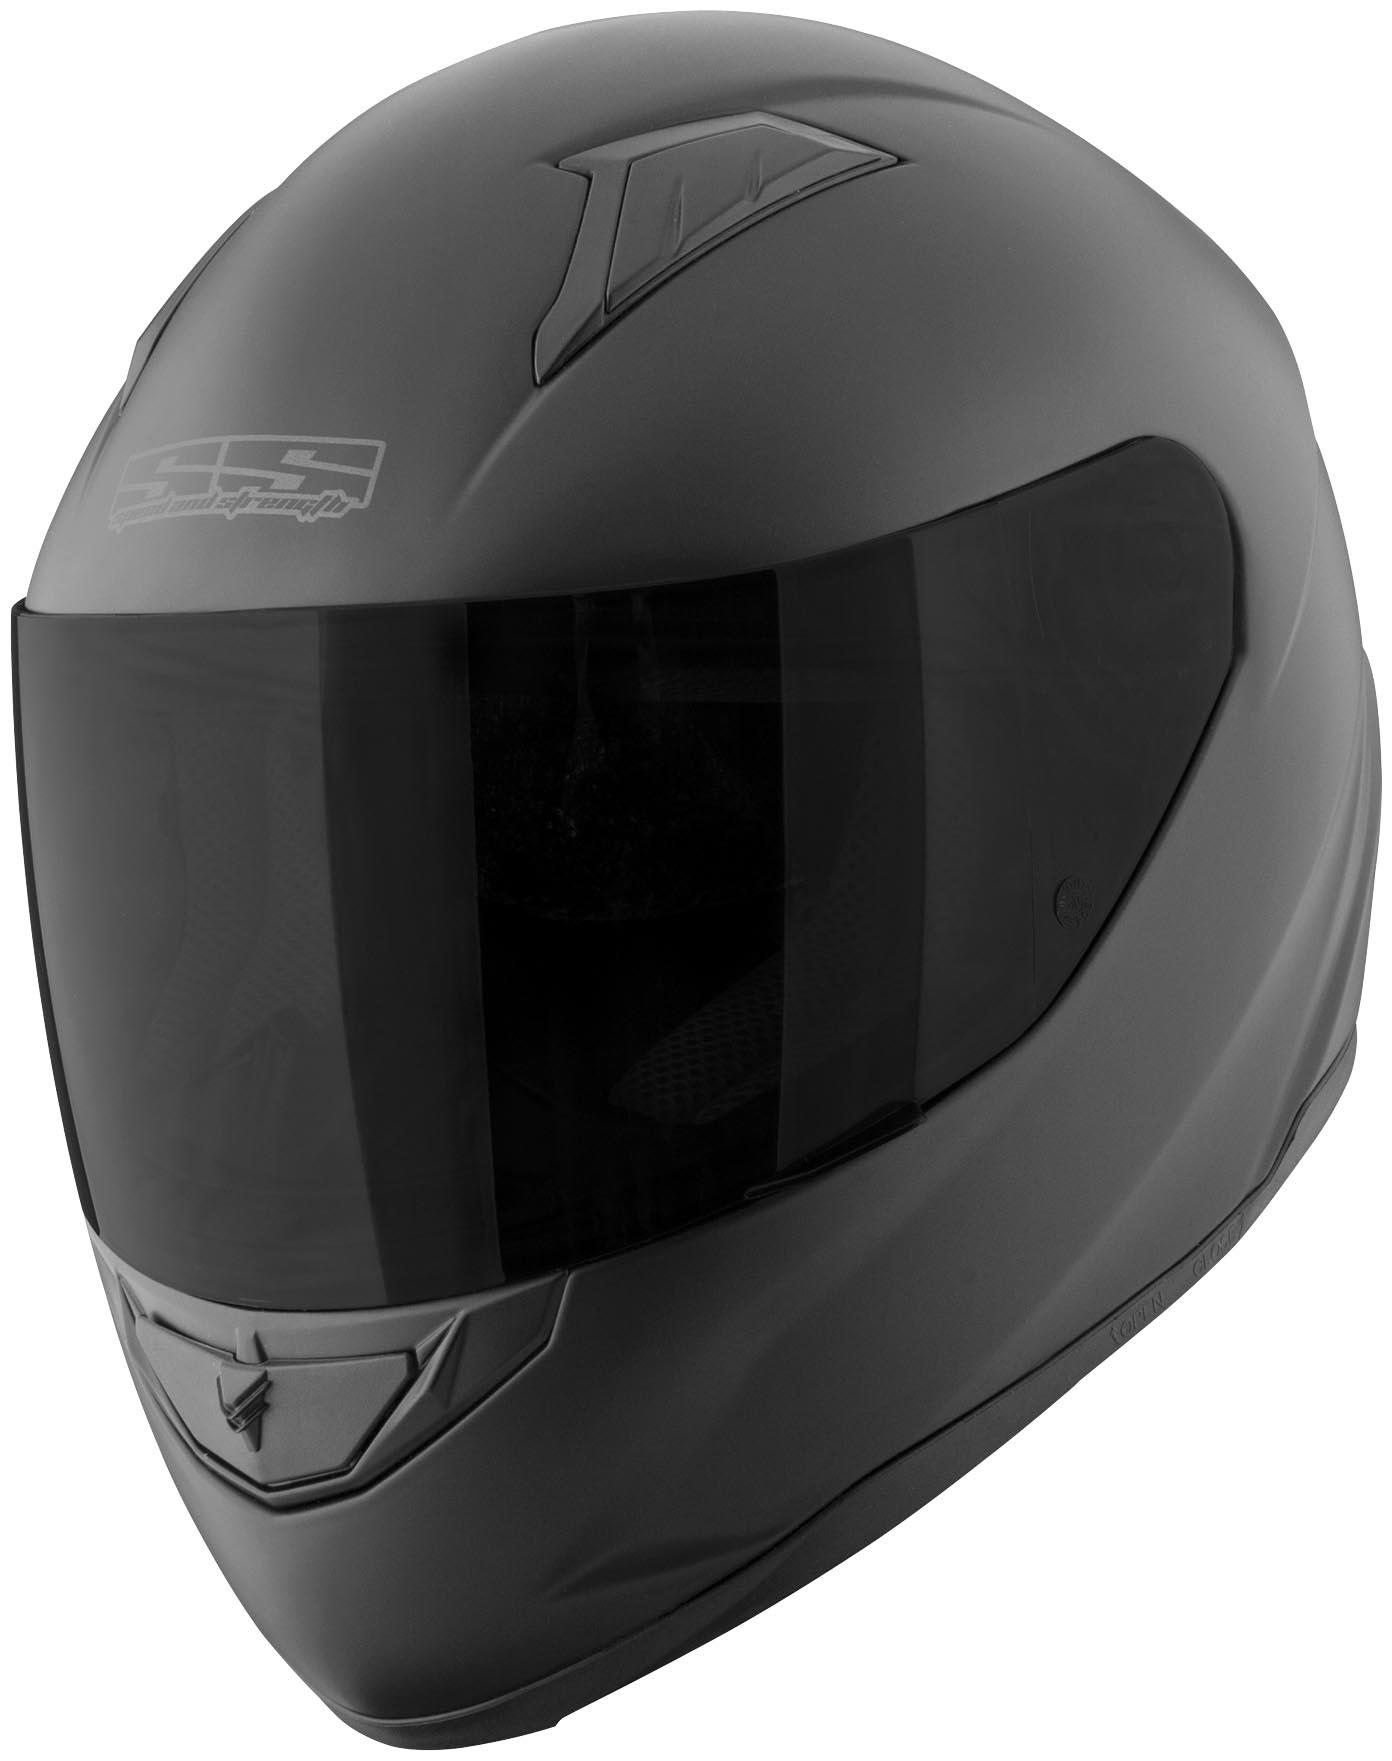 Motorcycle Helmets For Sale >> Speed & Strength SS1100 Full Face Motorcycle Helmet - Matte Black